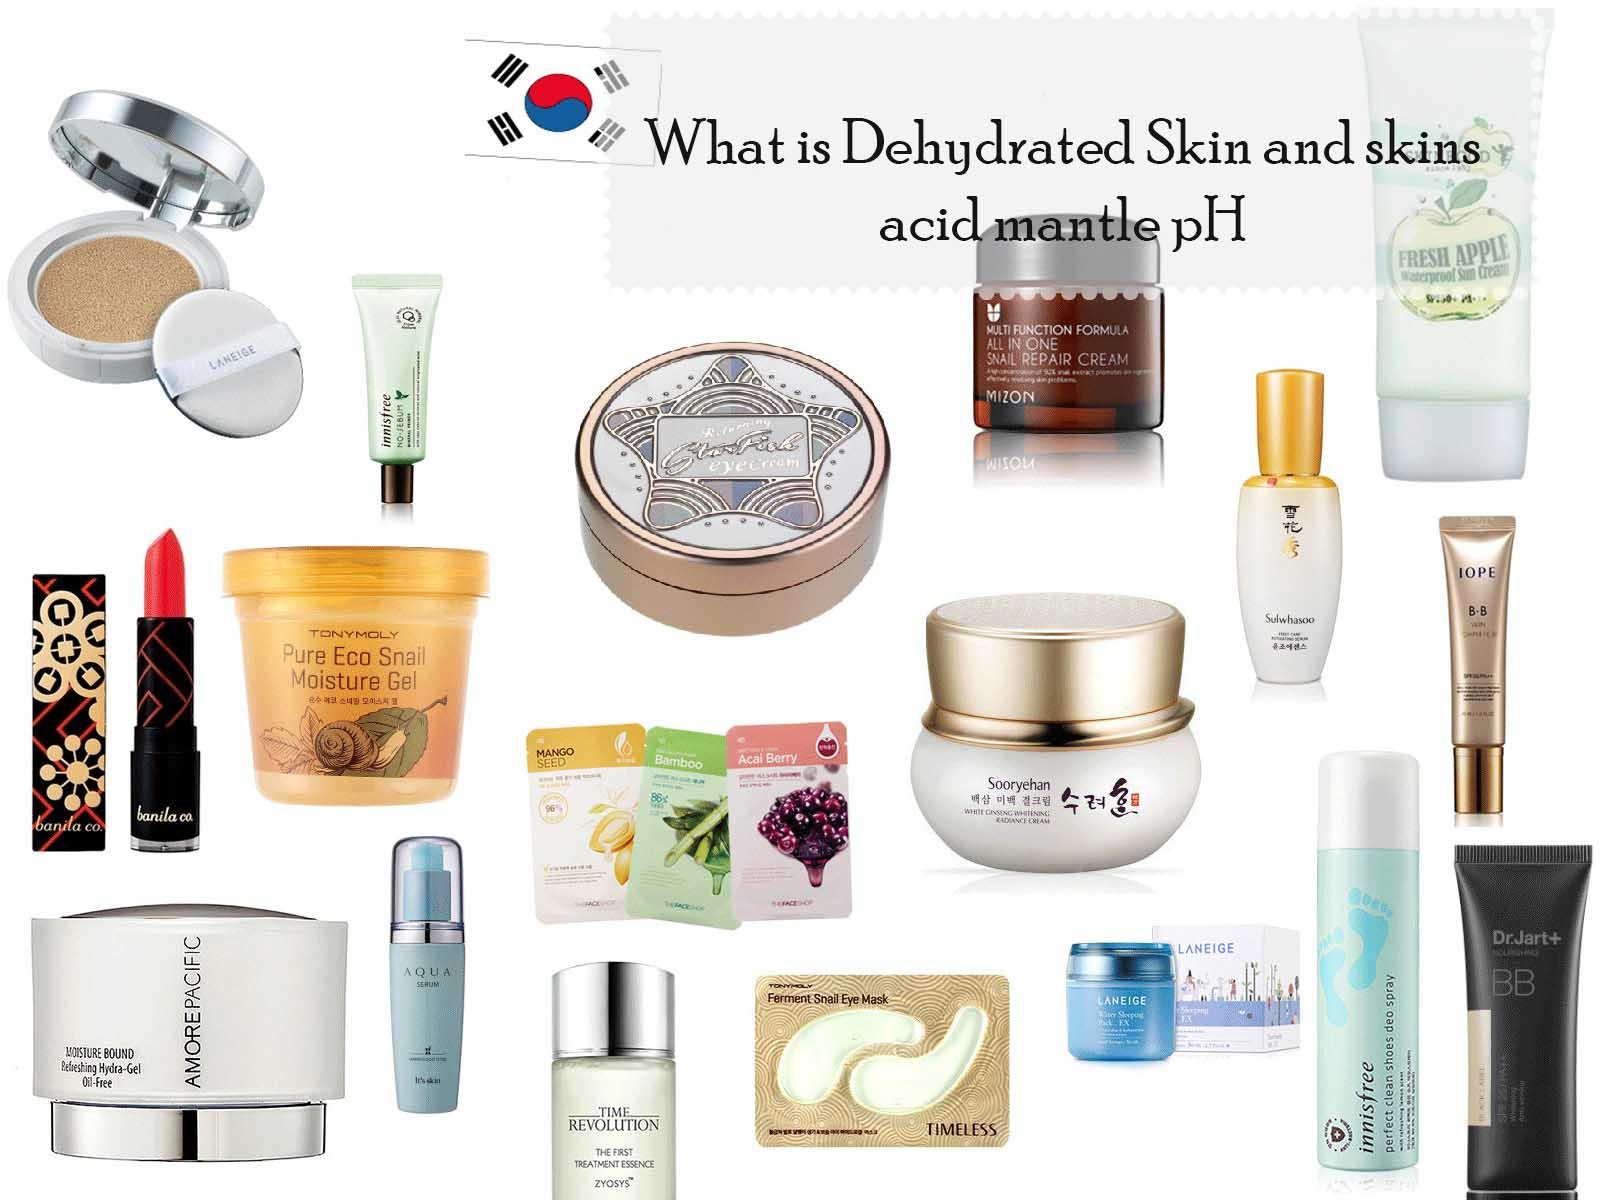 Skincare routine for dry sensitive acne prone skin